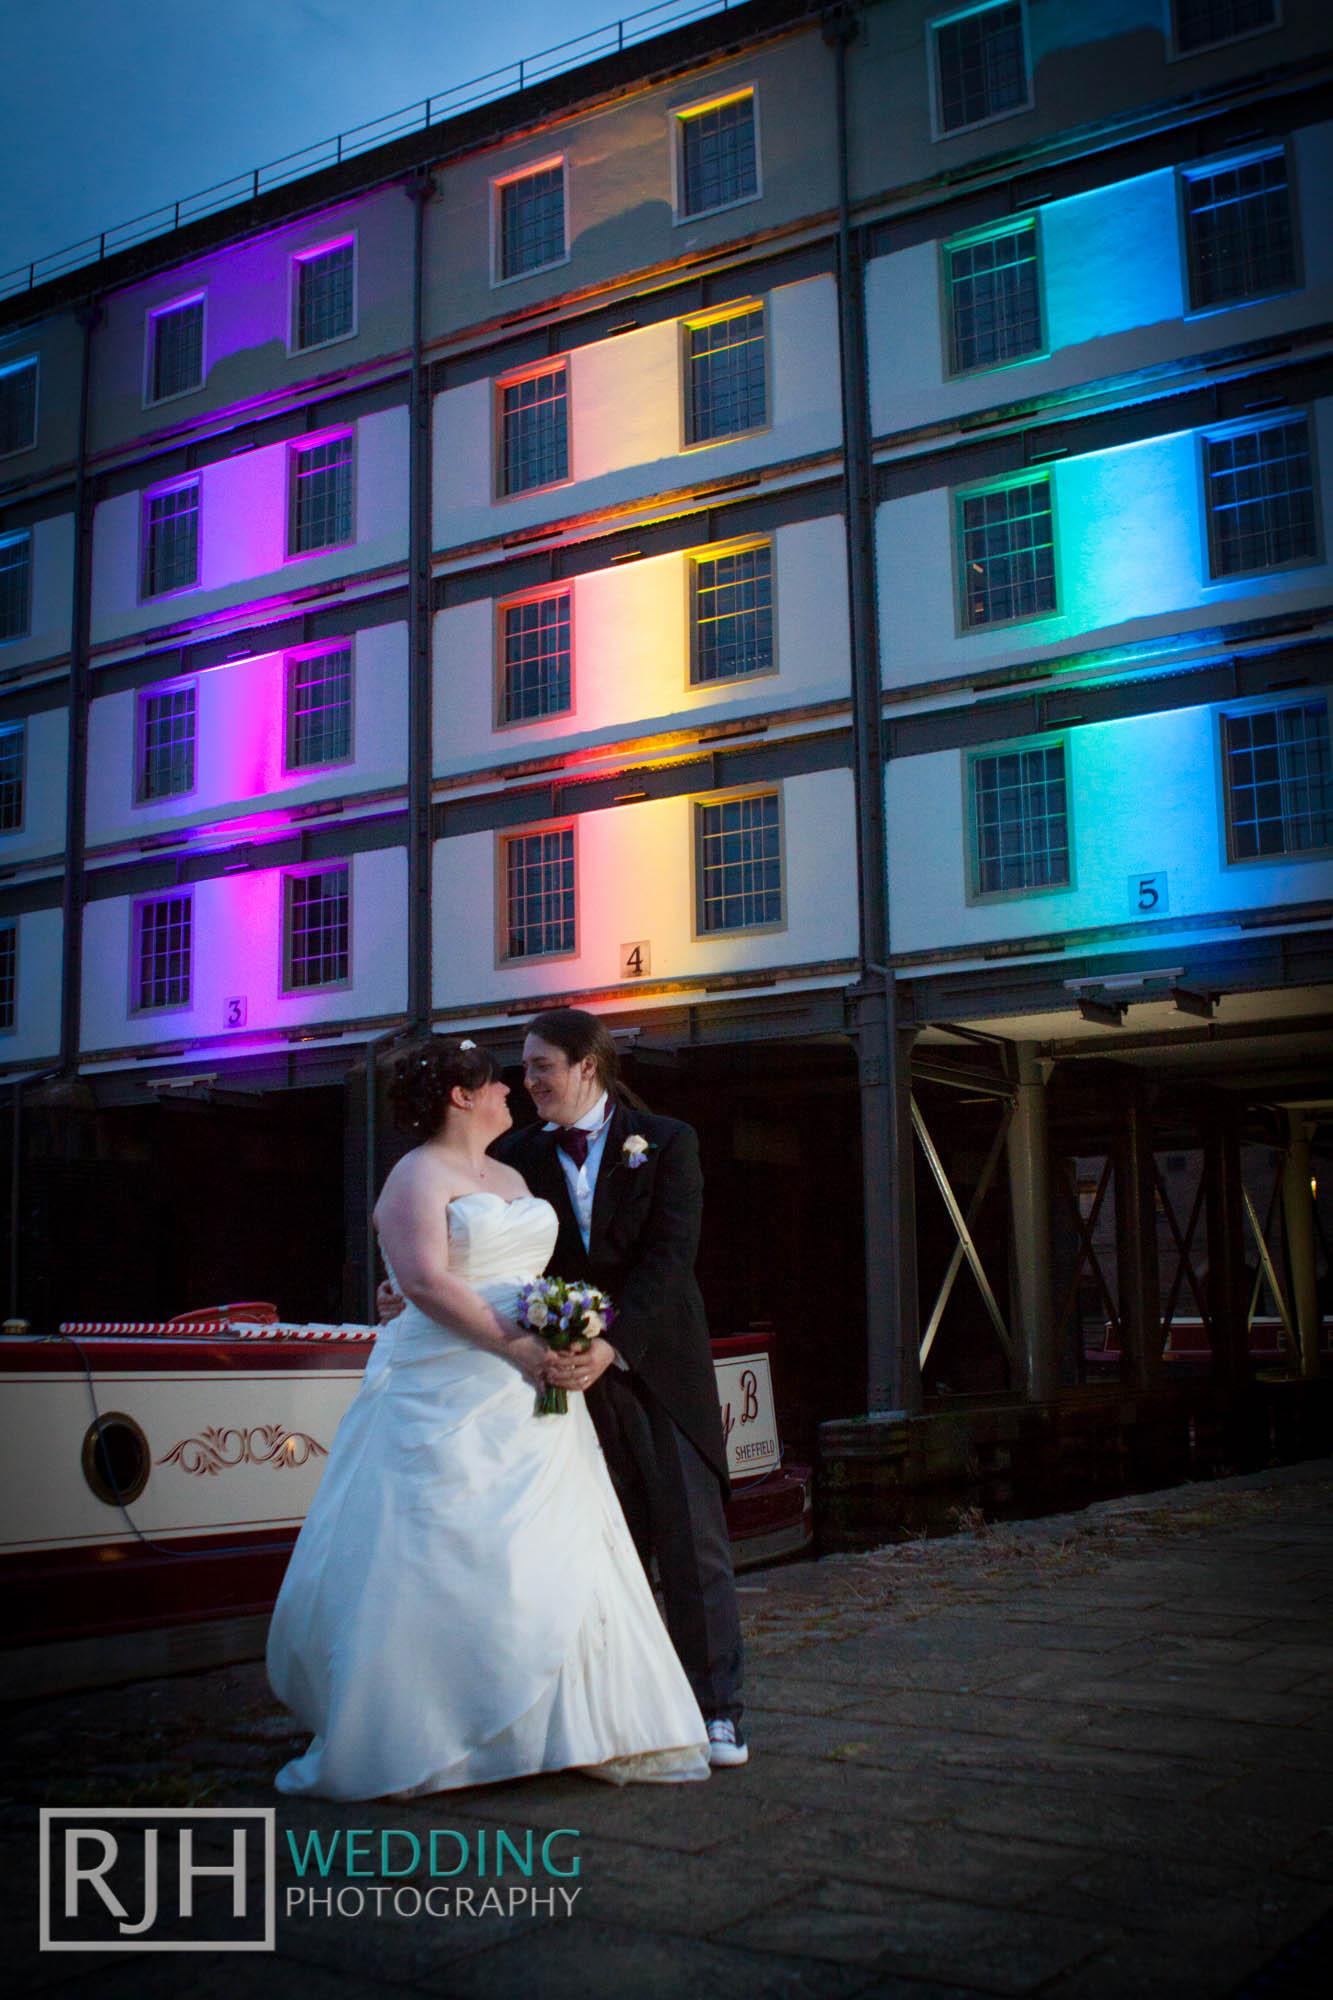 RJH Wedding Photography_2014 highlights_45.jpg